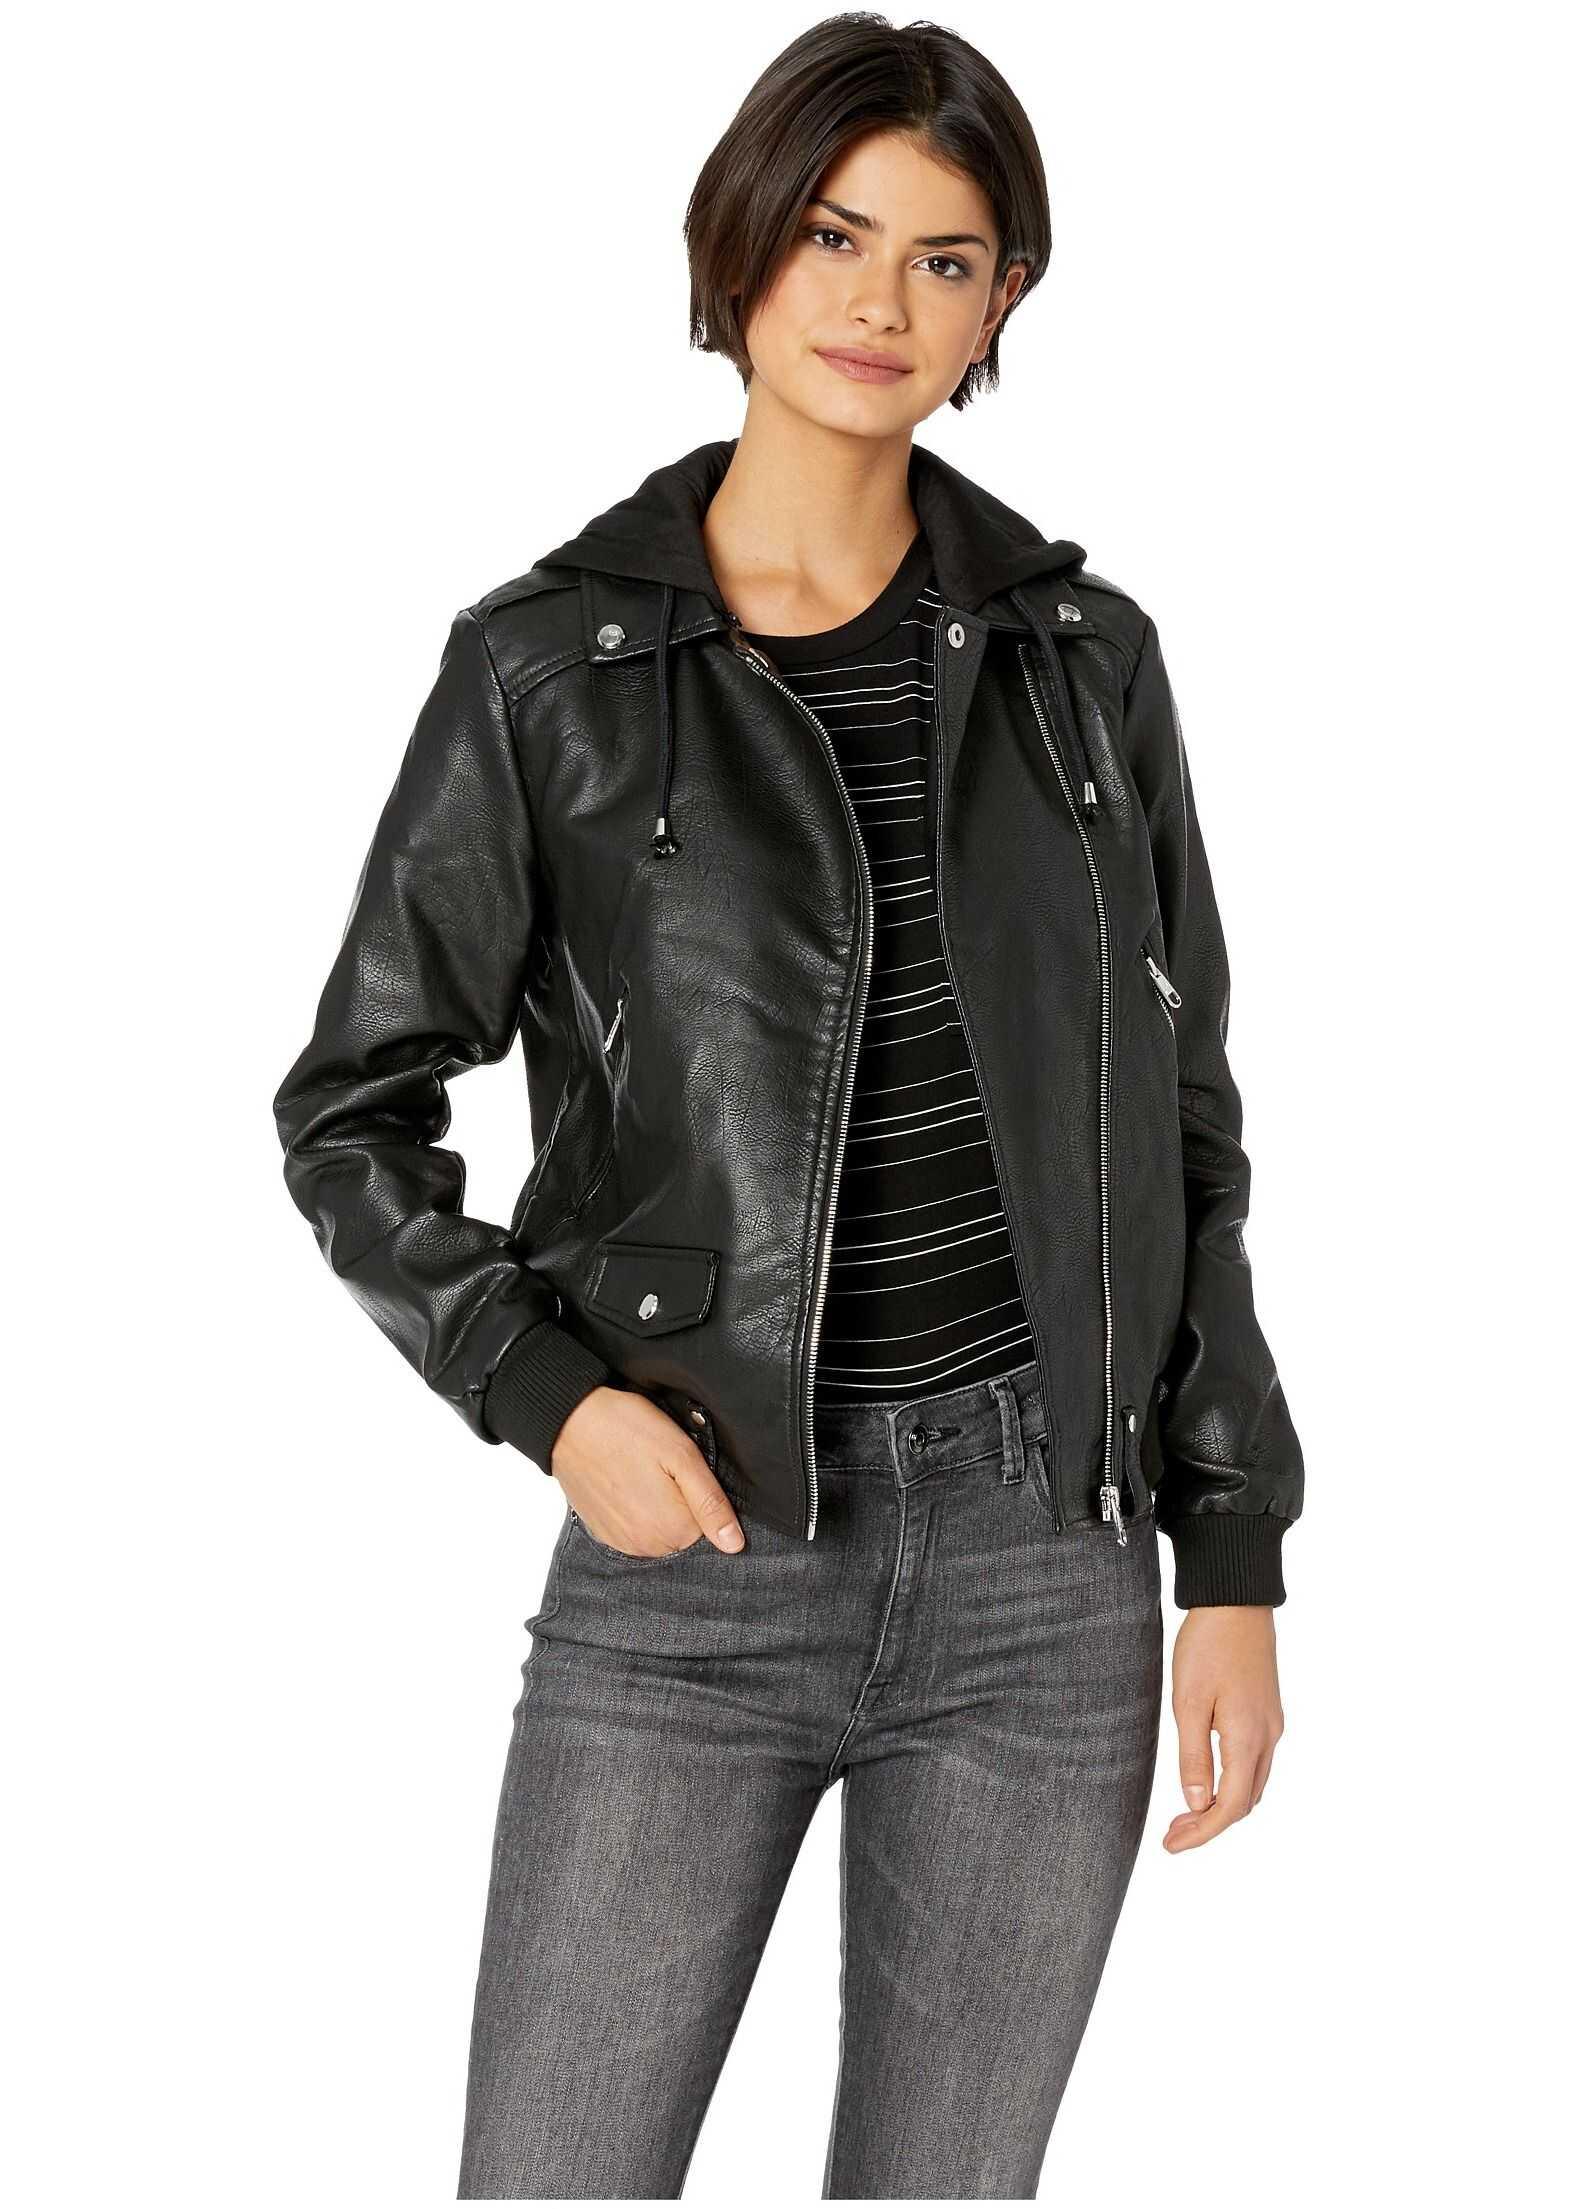 Steve Madden Pu Moto Jacket Black